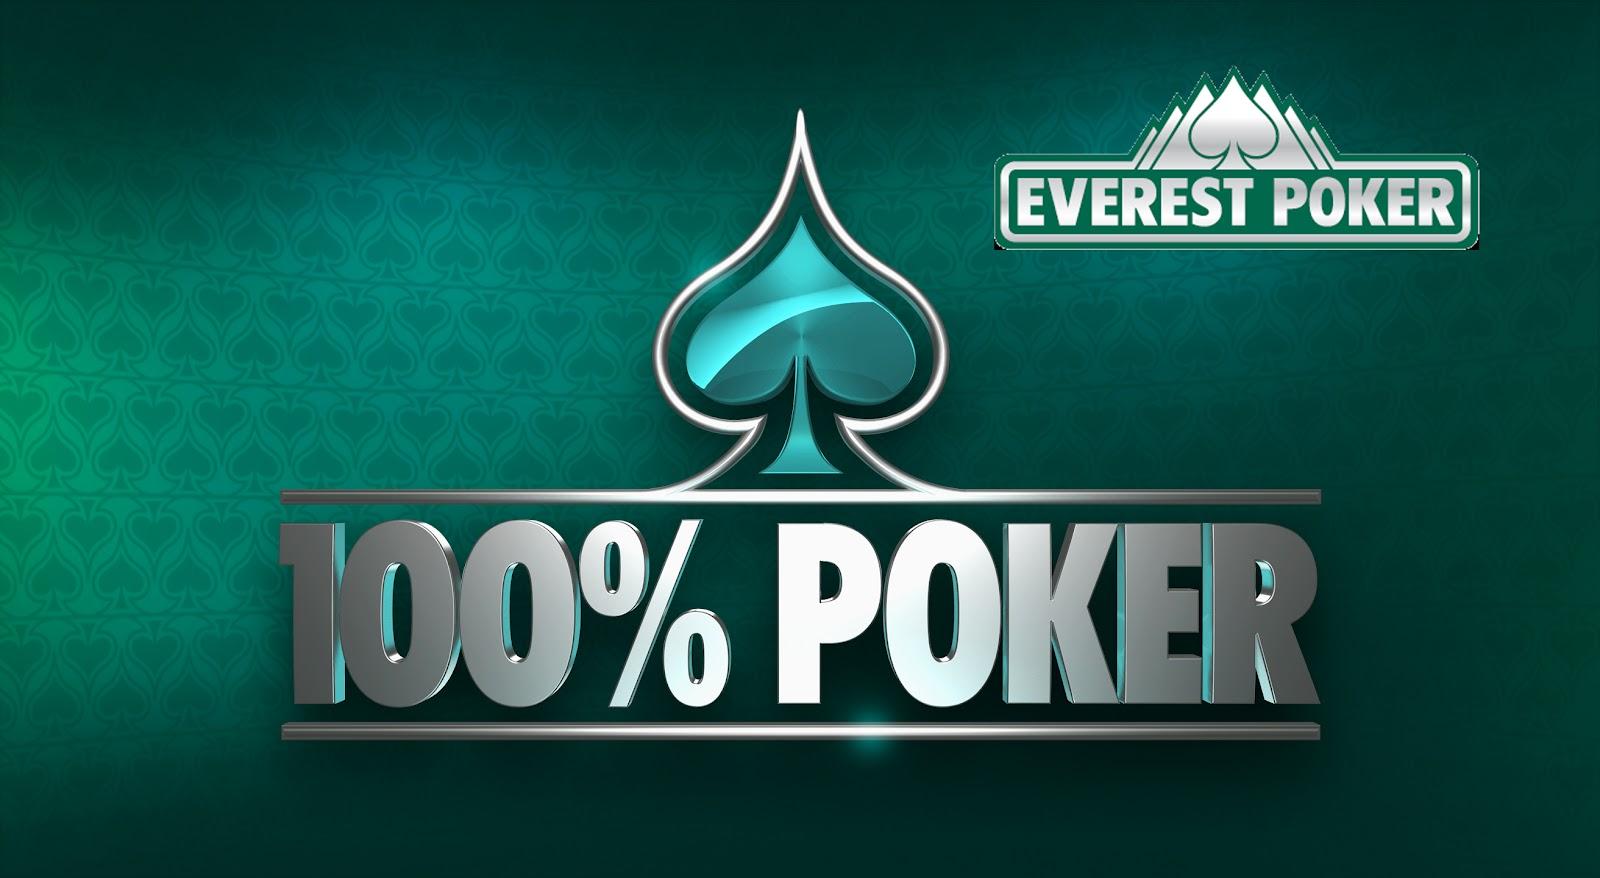 100% poker m6